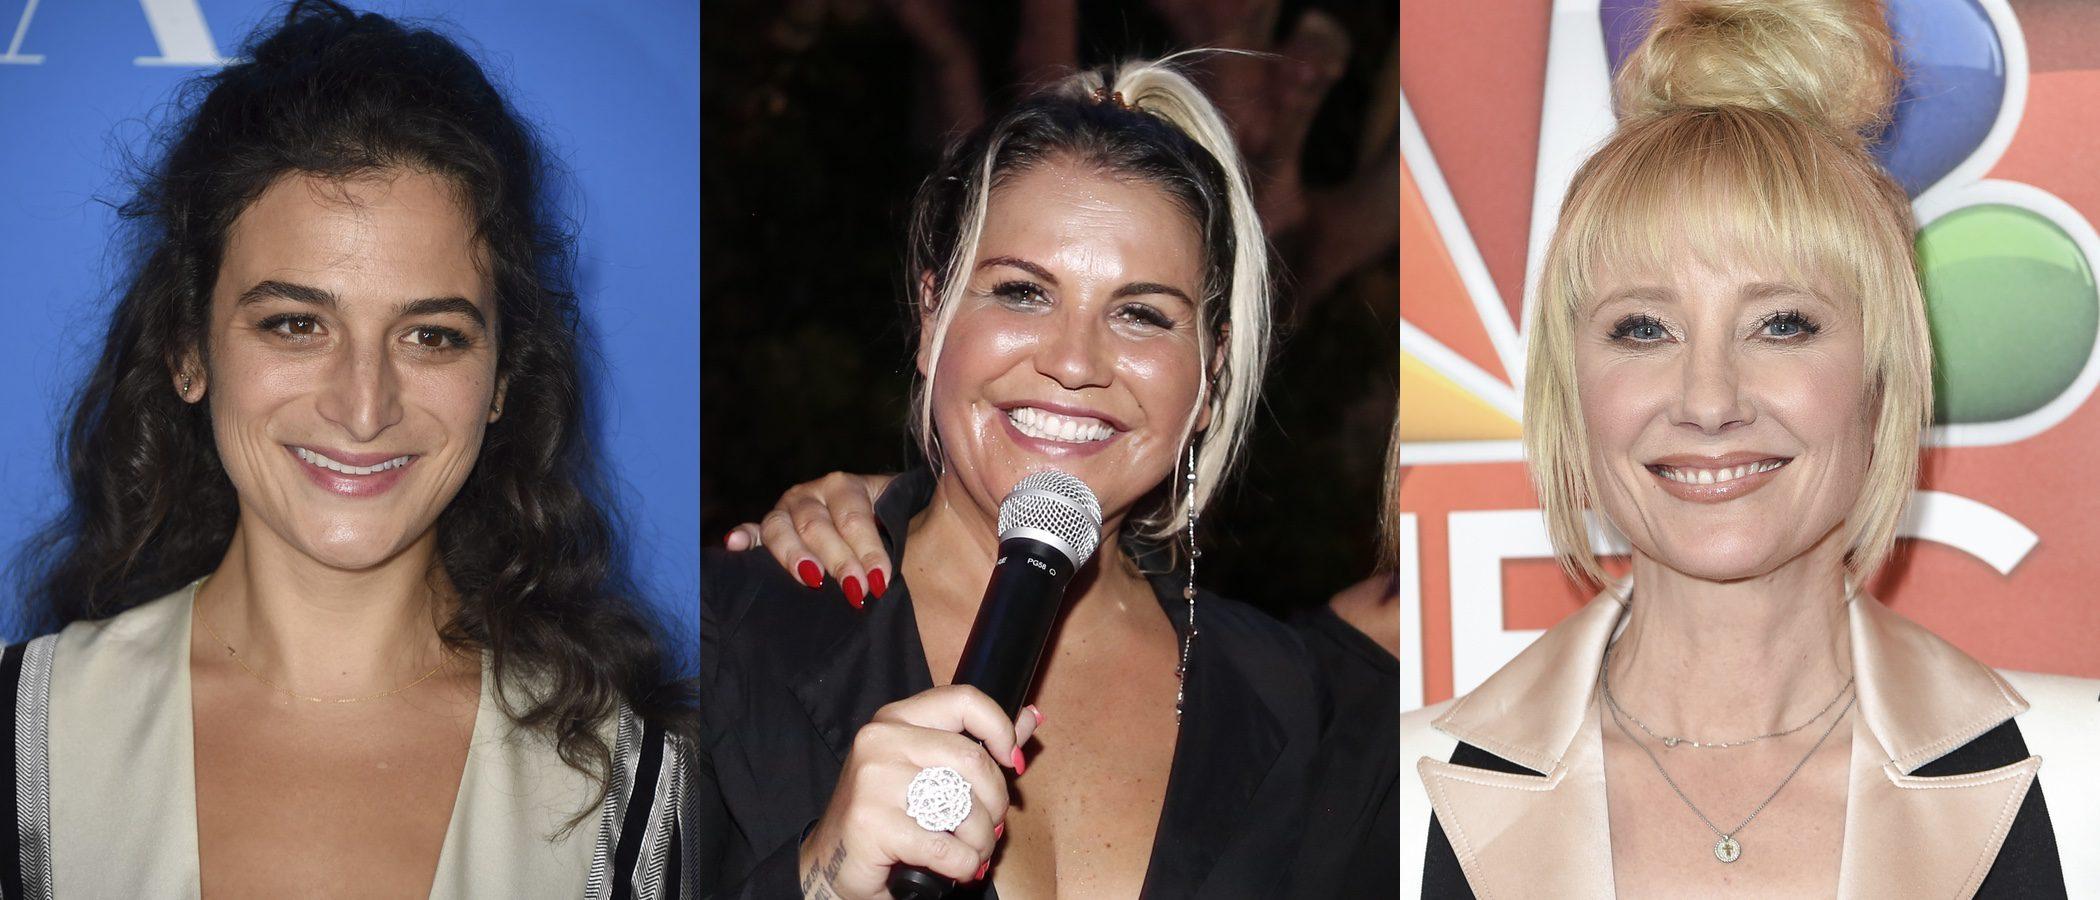 Jenny Slate, Katia Aveiro y Anne Heche, entre los peores beauty looks de la semana